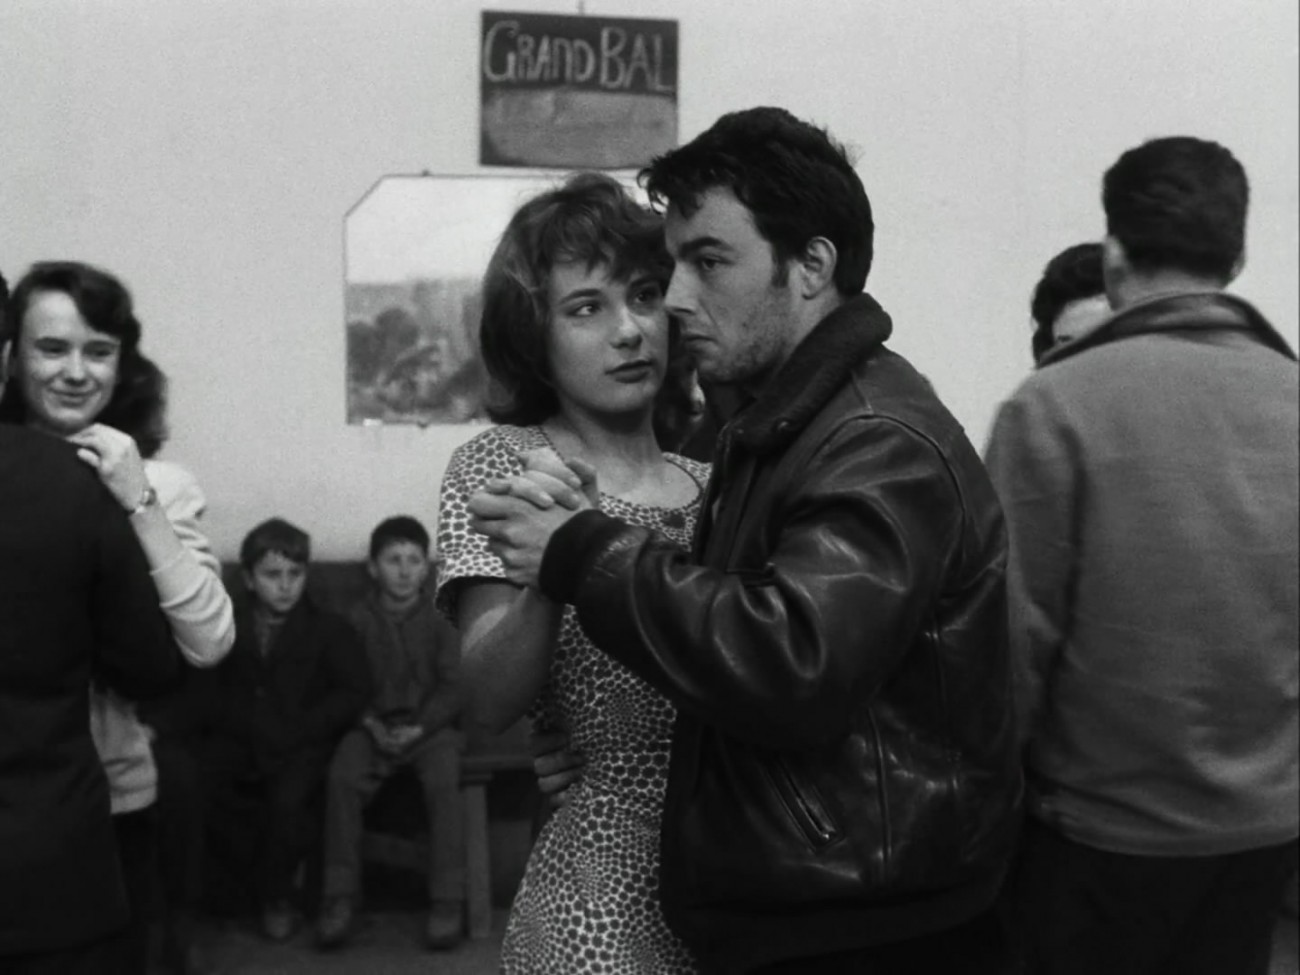 Le.Beau.Serge.1958.1080p.BluRay.x264-CiNEFiLE.mkv_snapshot_01.10.52_[2011.09.26_10.40.32]